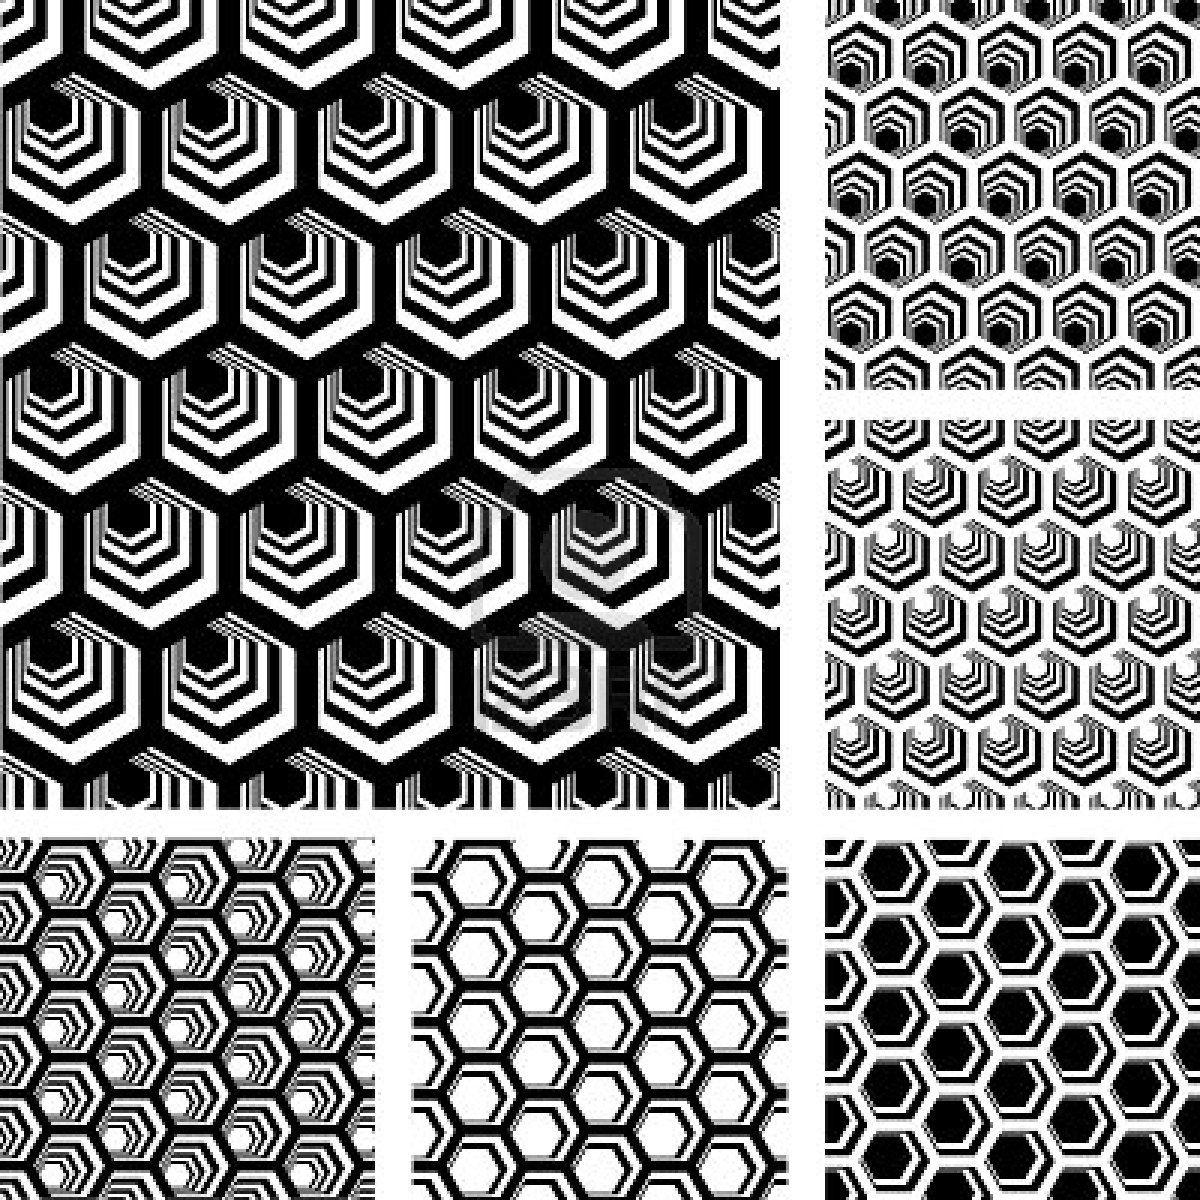 3d honeycomb patterns patterns pinterest honeycomb